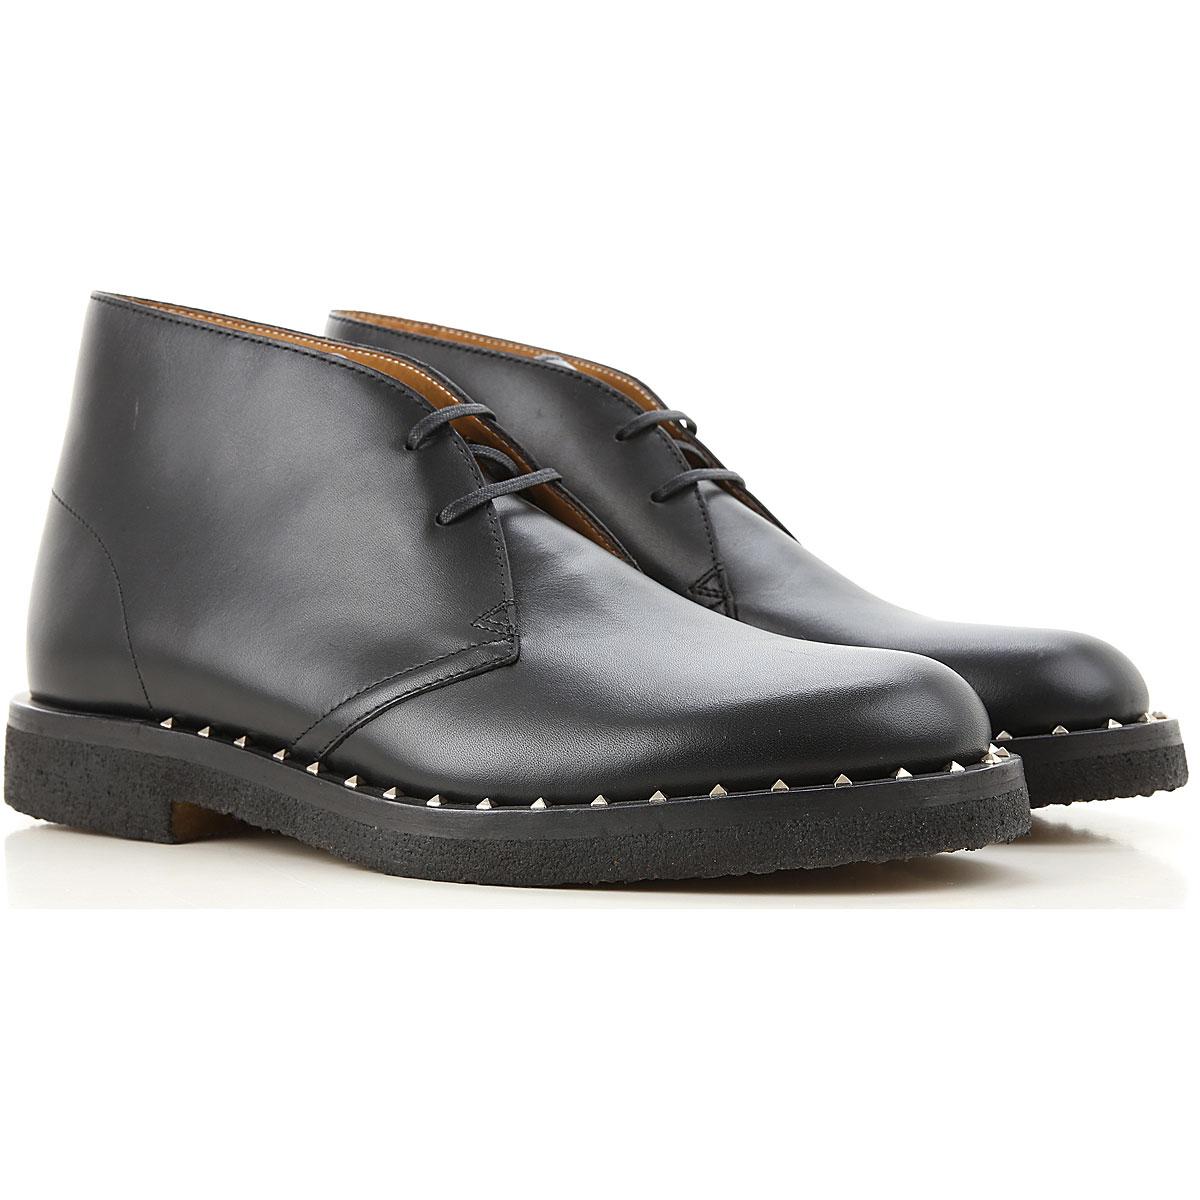 Valentino Garavani Desert Boots Chukka for Men On Sale in Outlet, Black, Leather, 2019, 8 8.5 9 9.5